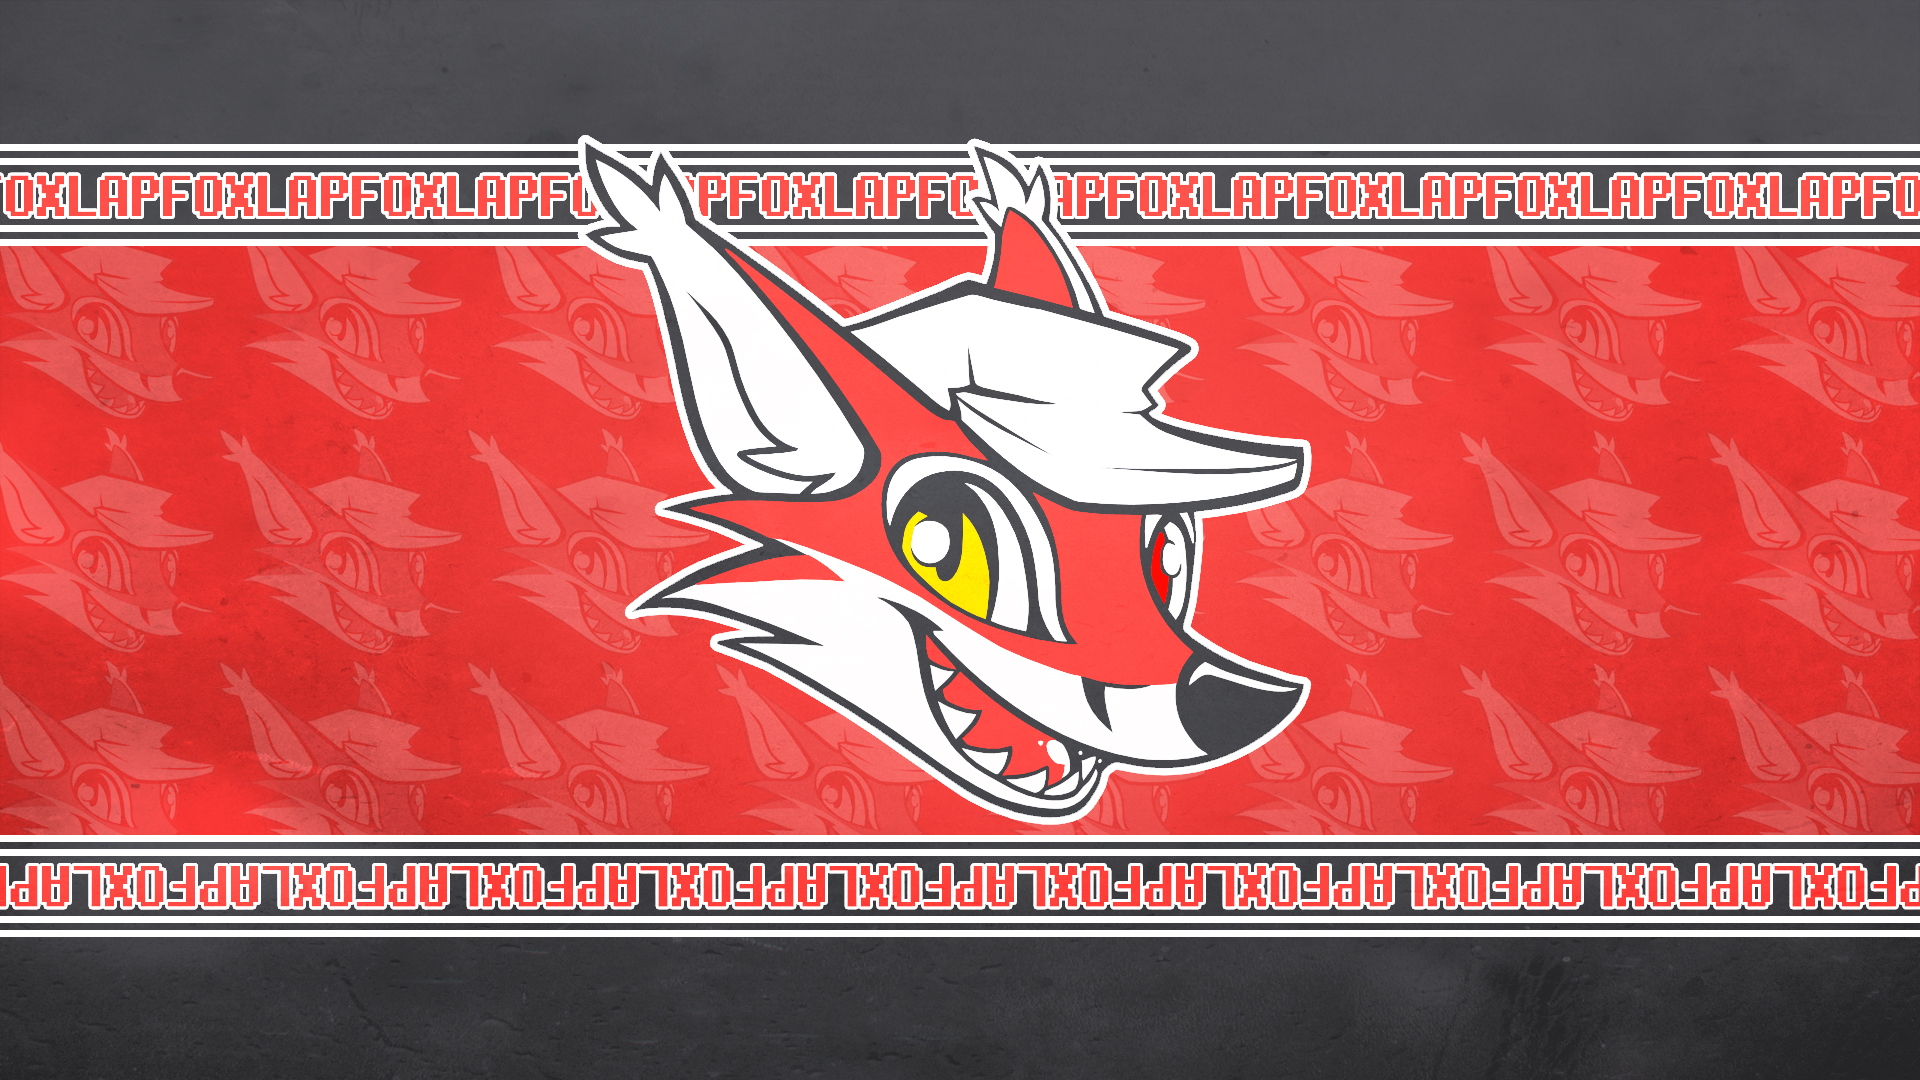 Lapfox wallpaper by Joetruck